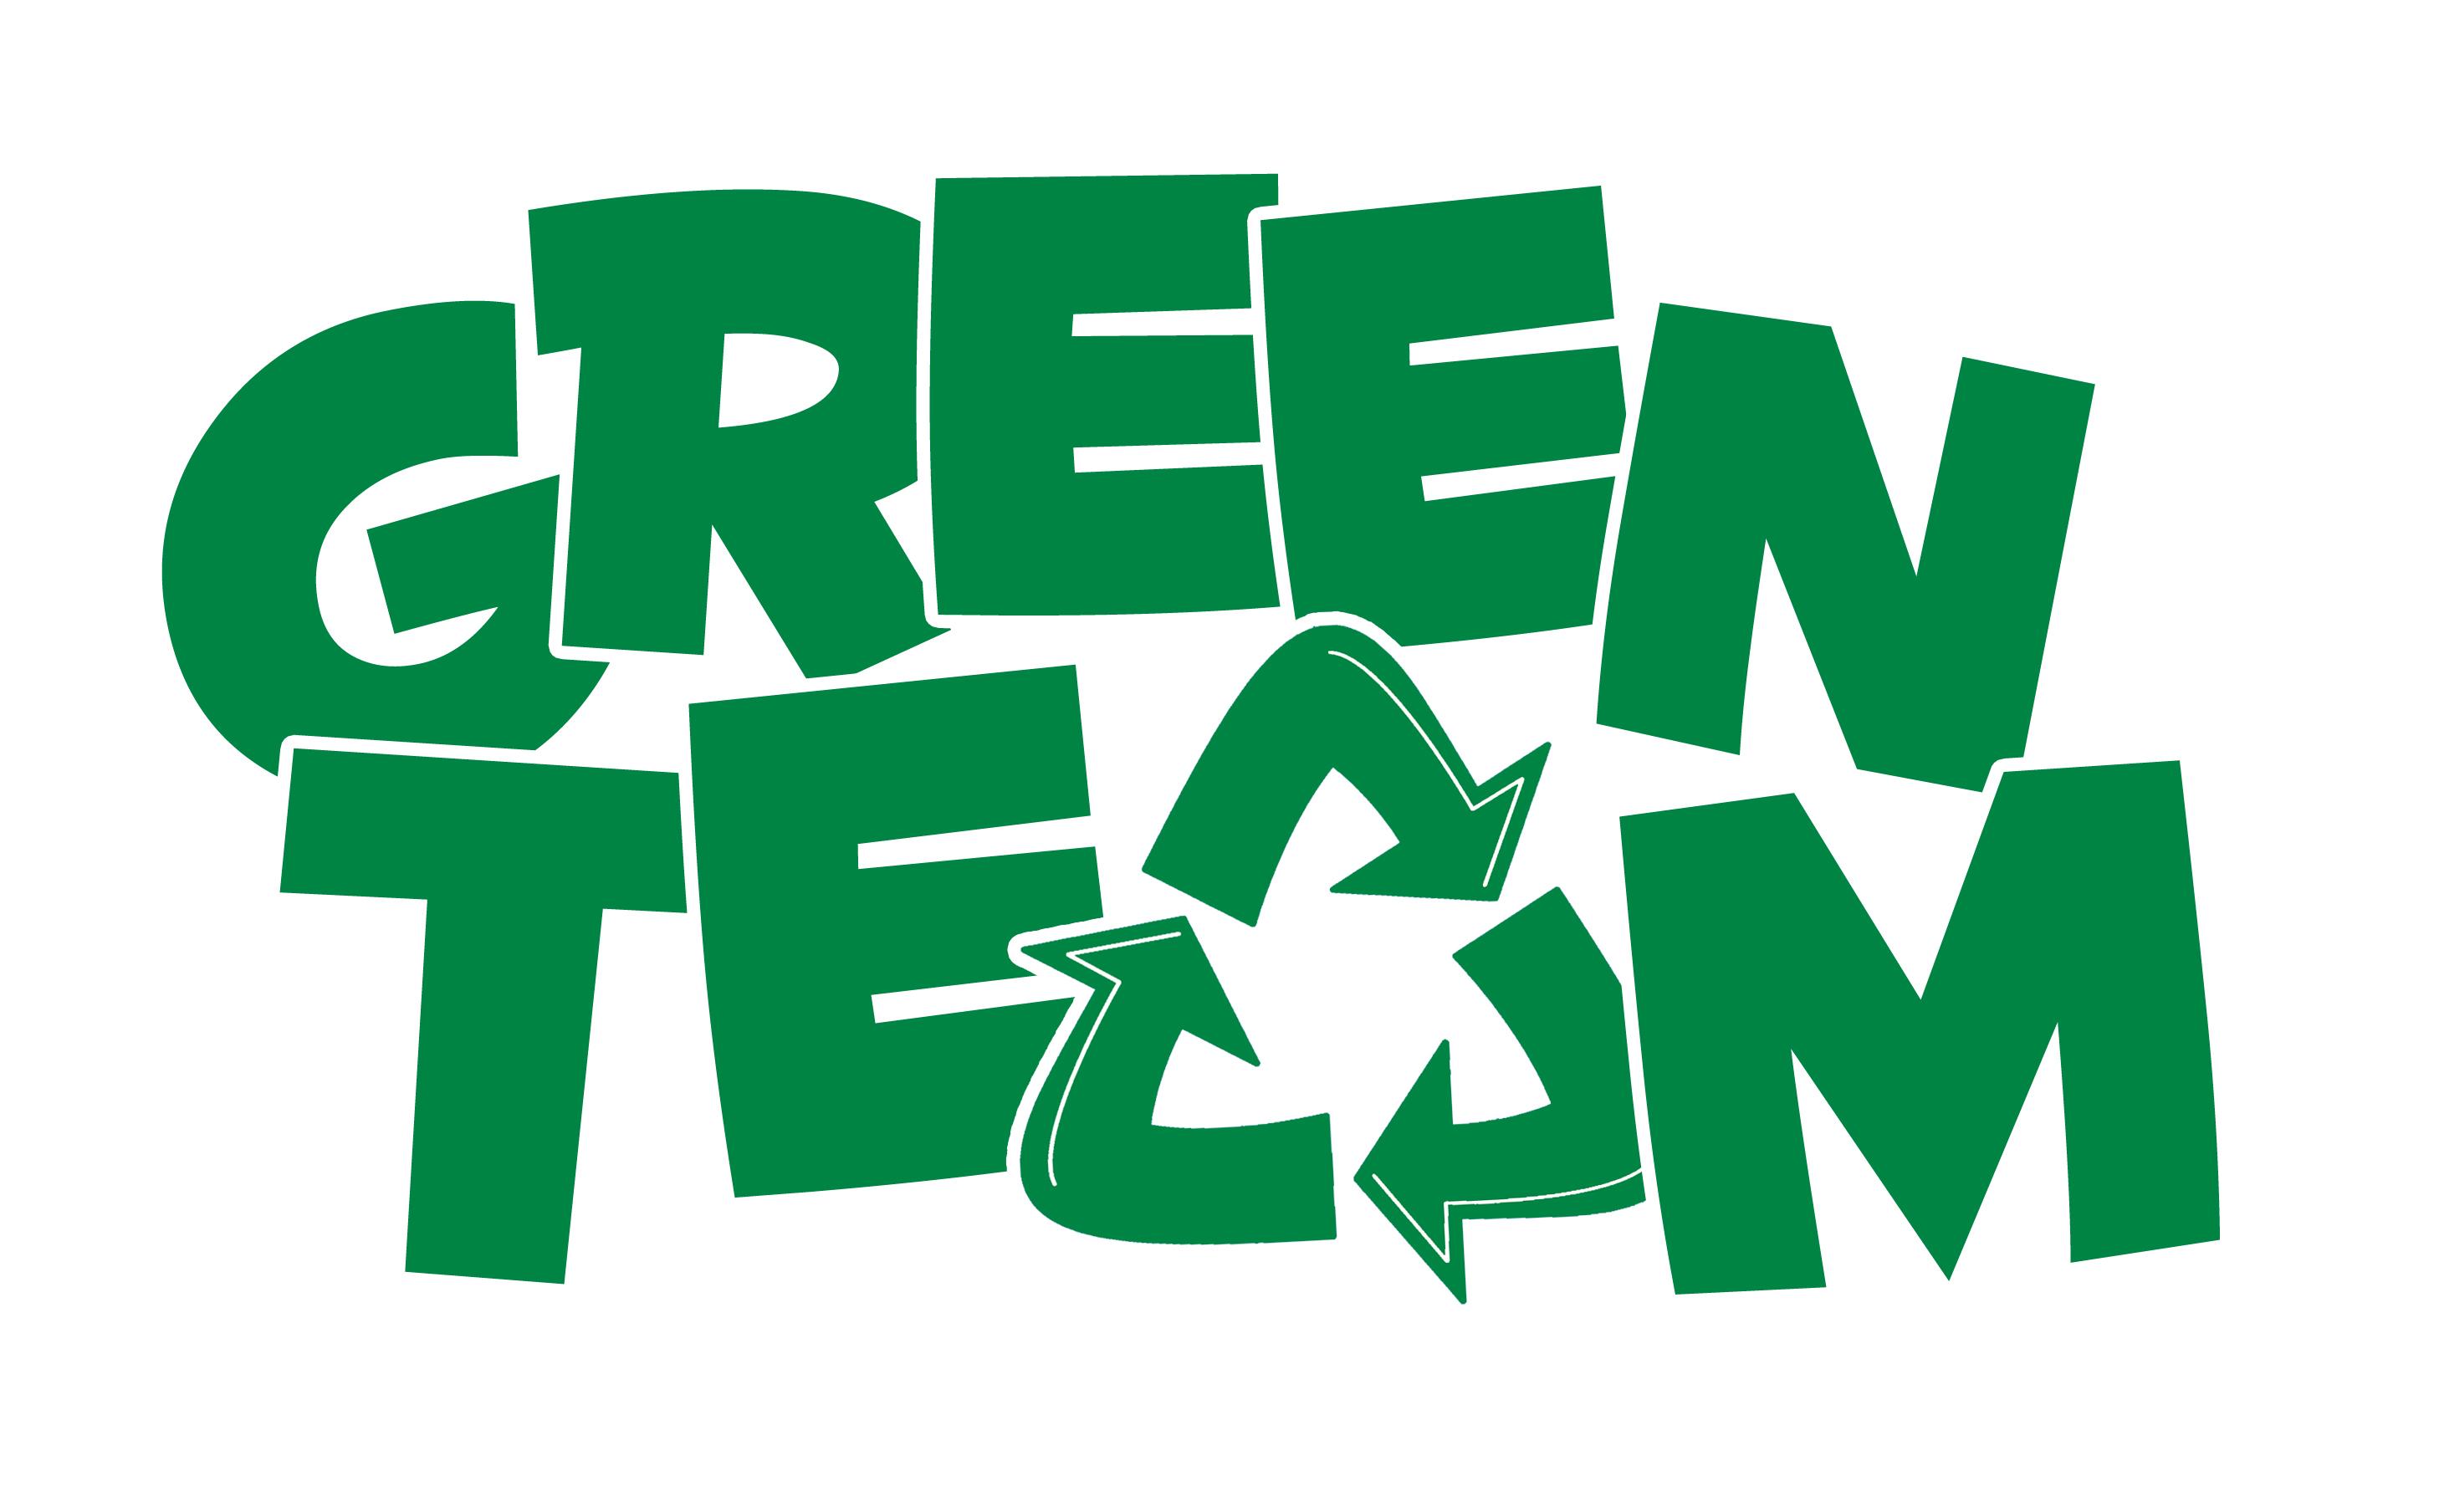 Image71151 - green team